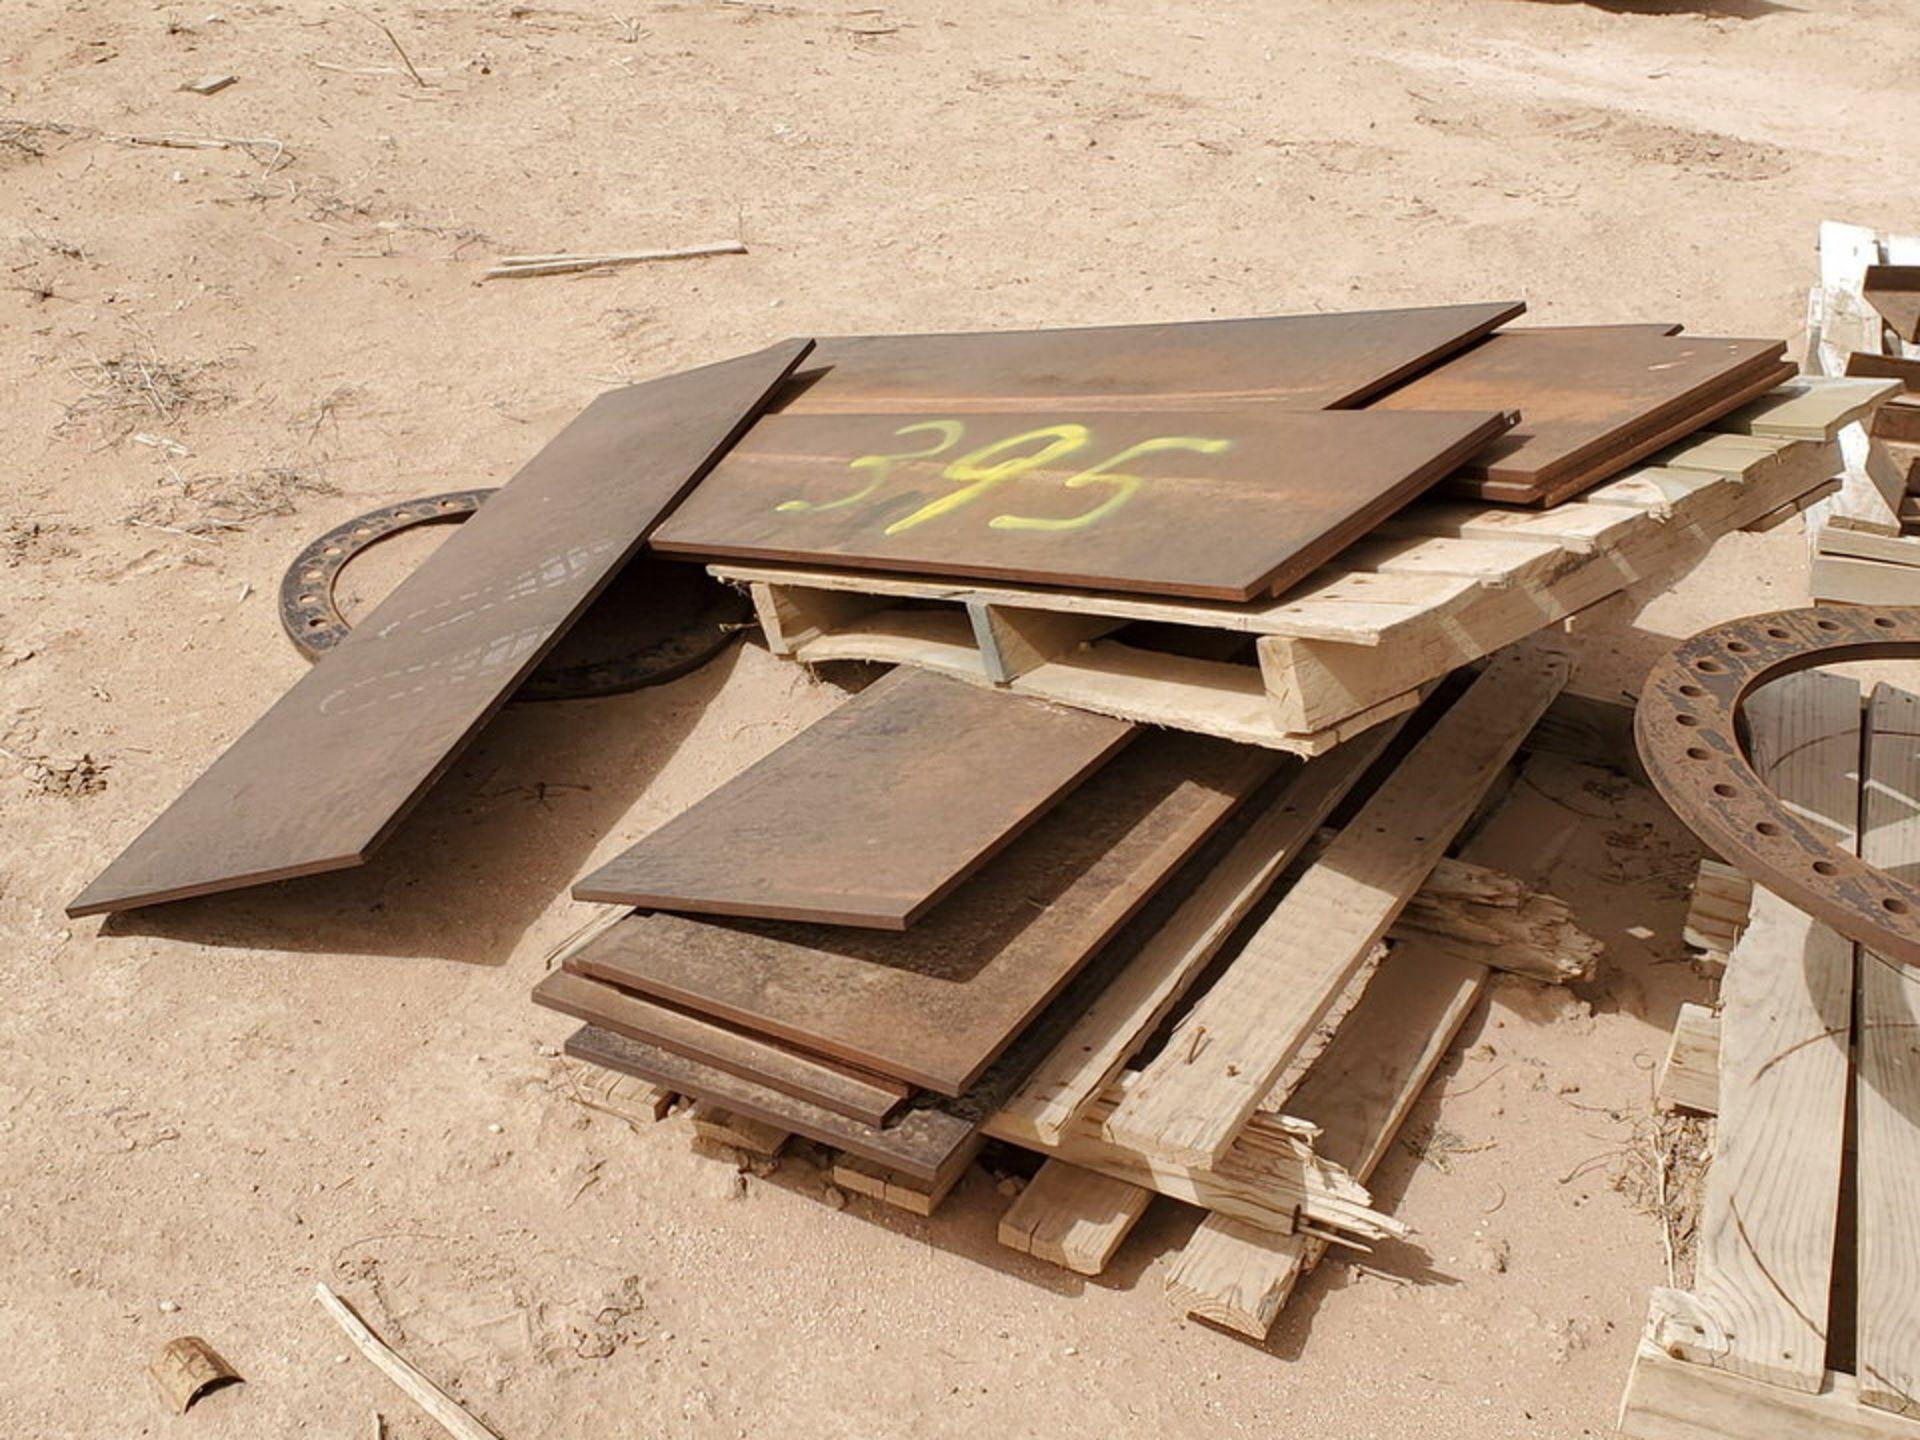 "Stl. Plates 12"" x 7'3"" - 14"" x 56"" - Image 7 of 7"